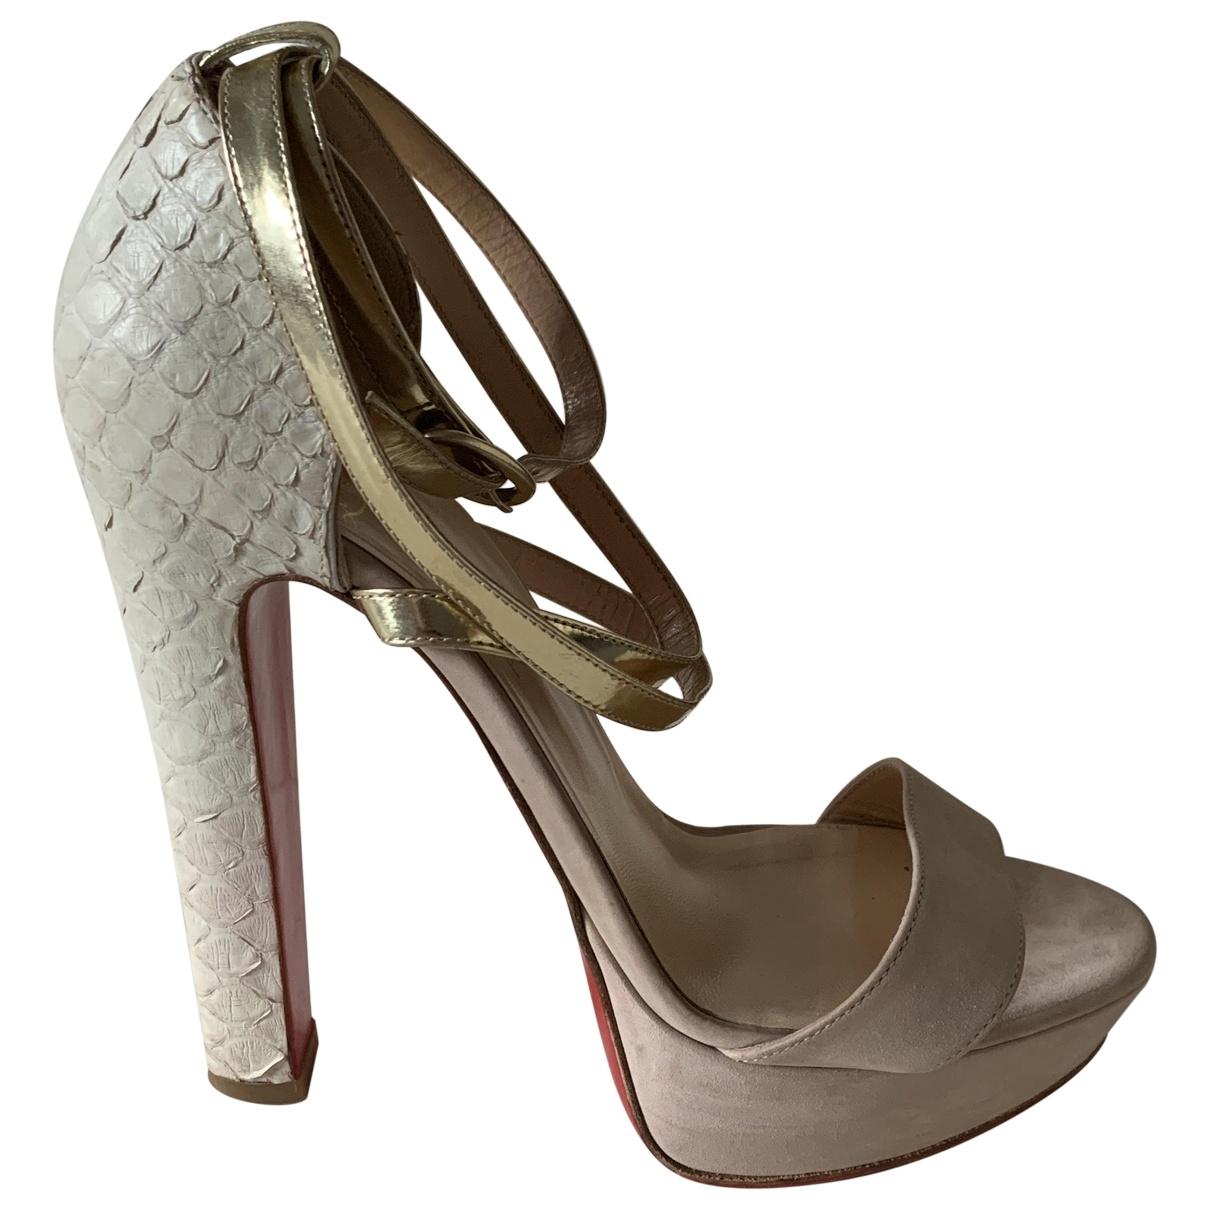 Christian Louboutin \N Beige Suede Sandals for Women 6 UK